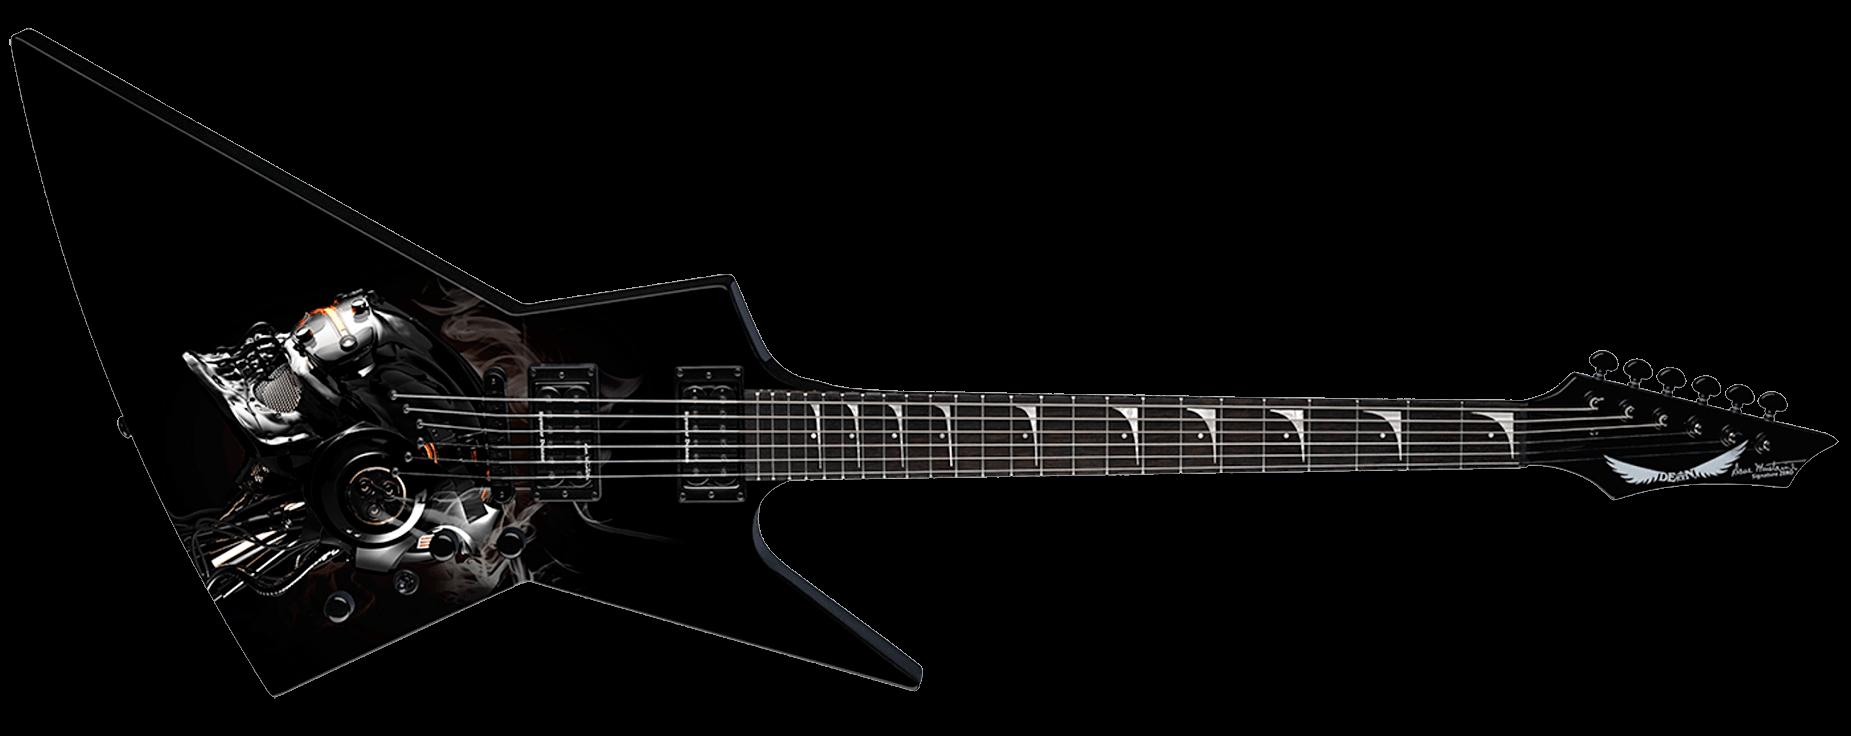 Dean Zero Dave Mustaine Vic Rattlehead